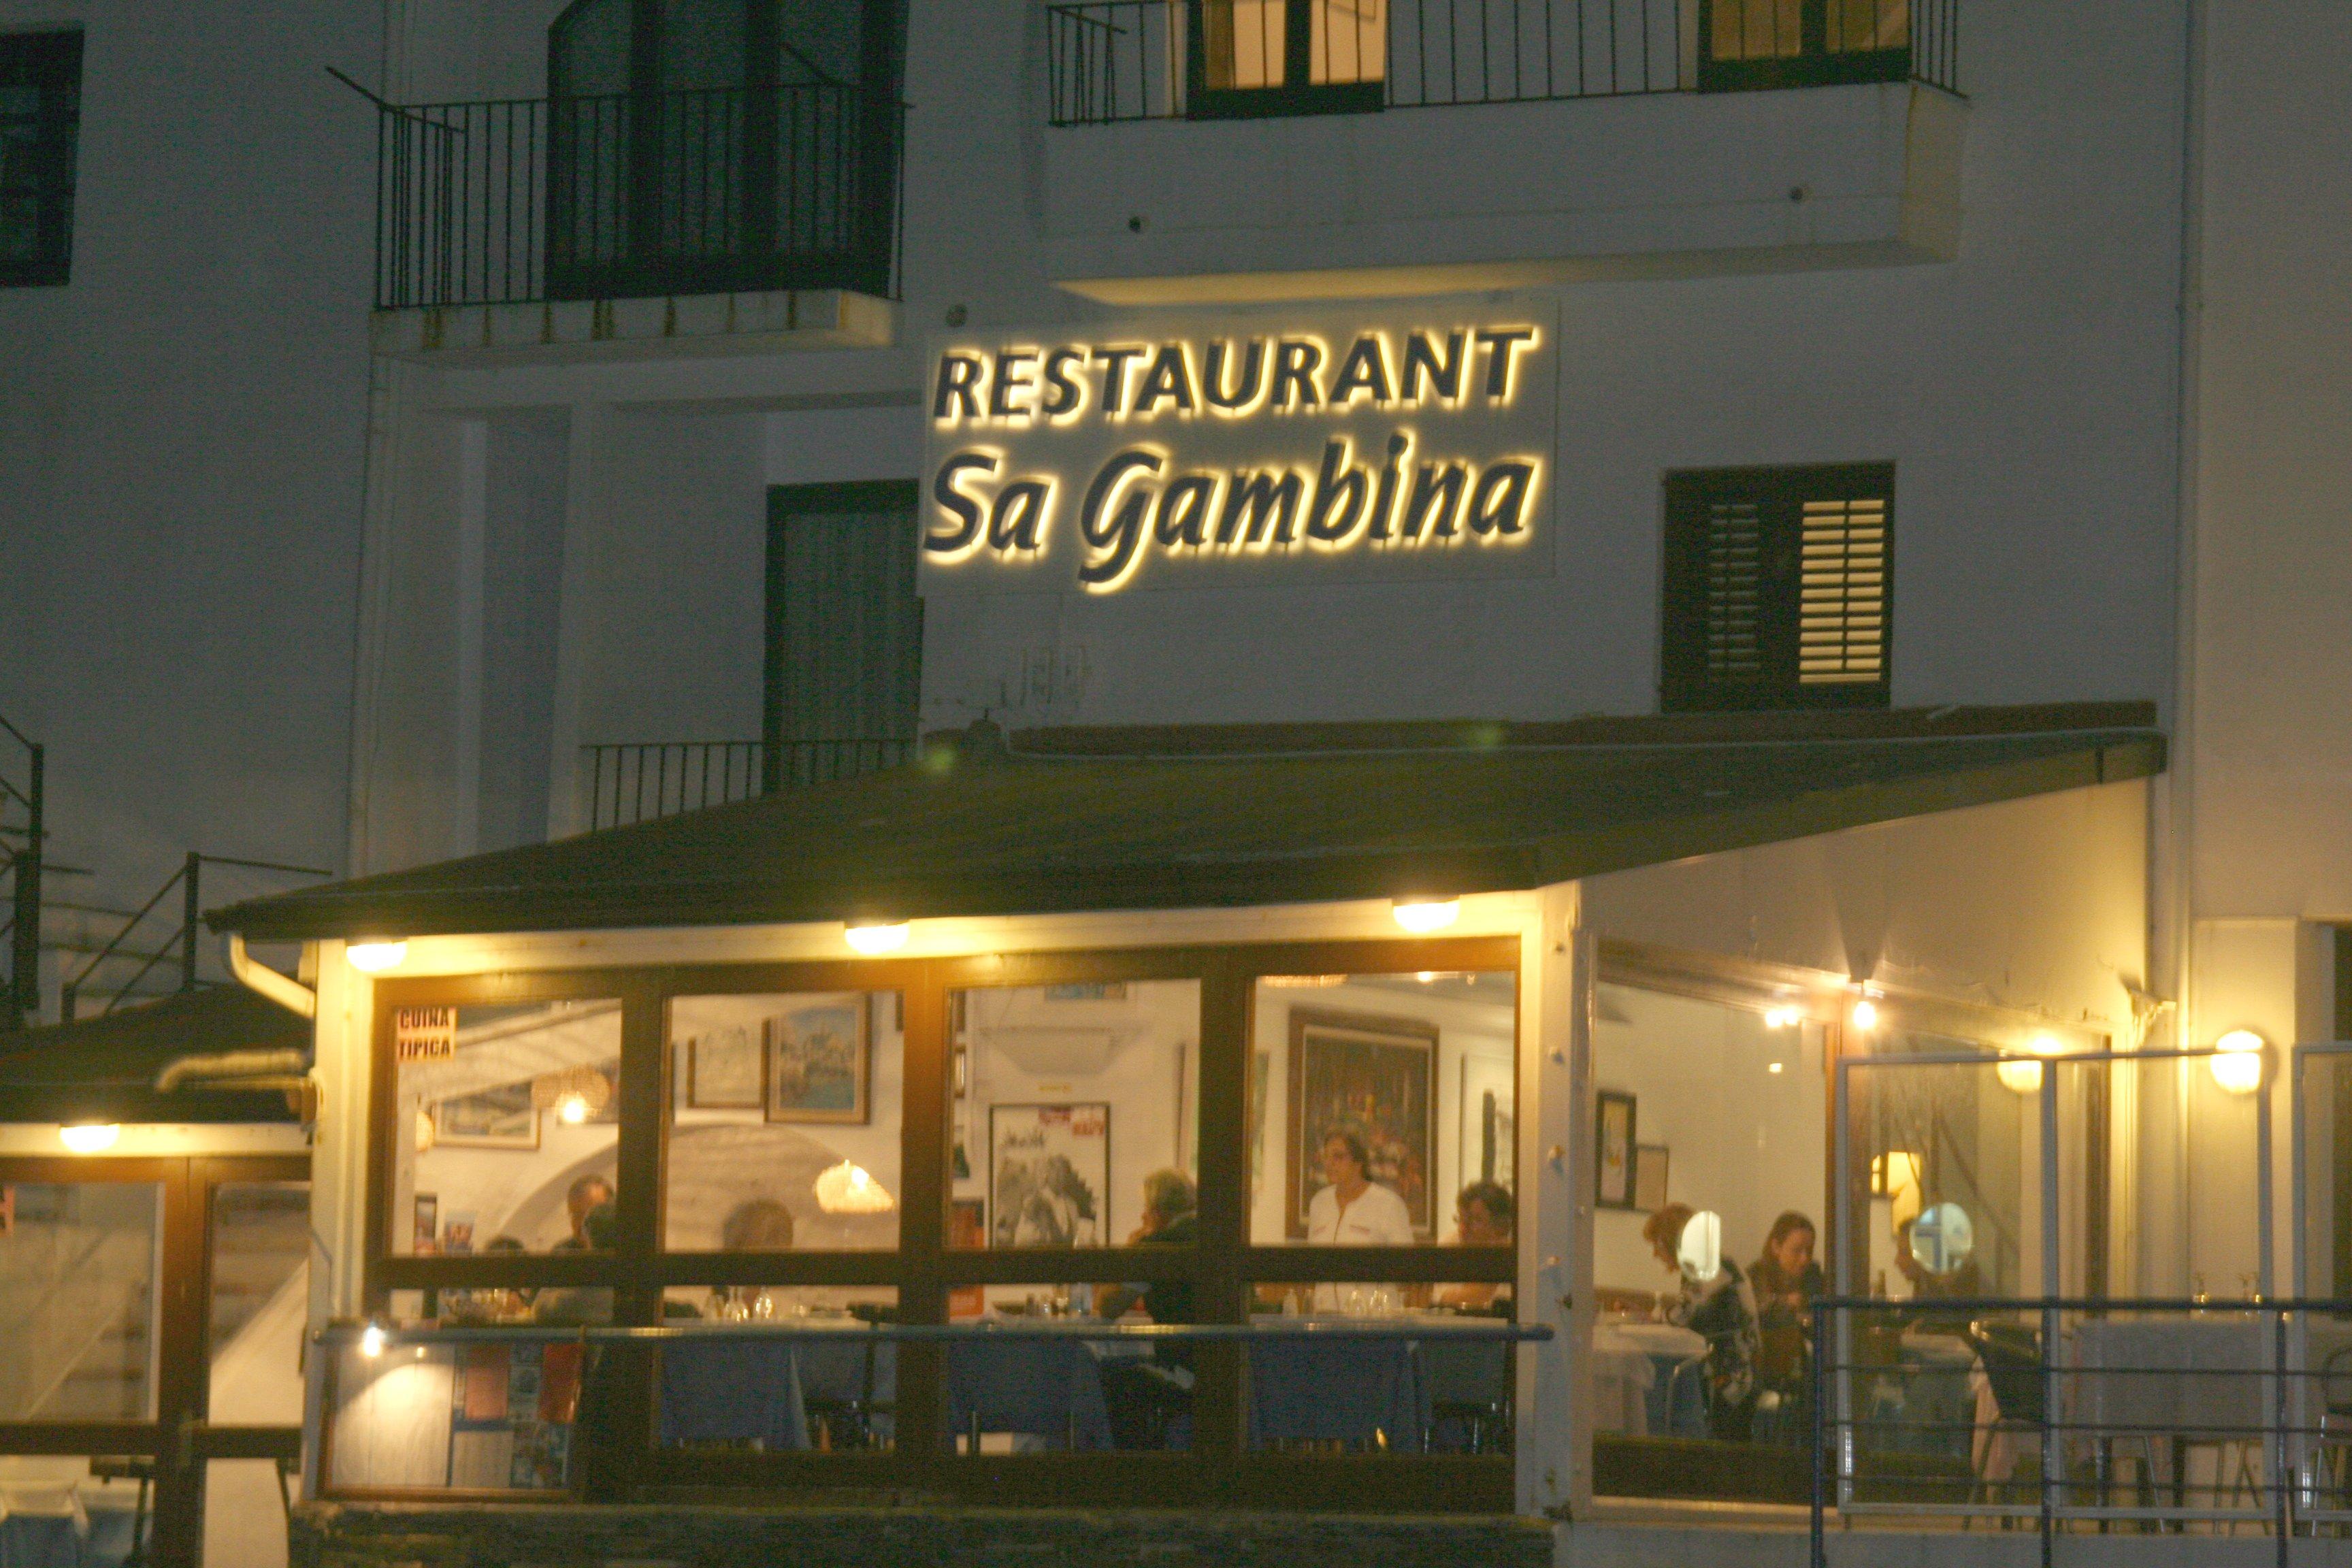 Restaurant Sa Gambina